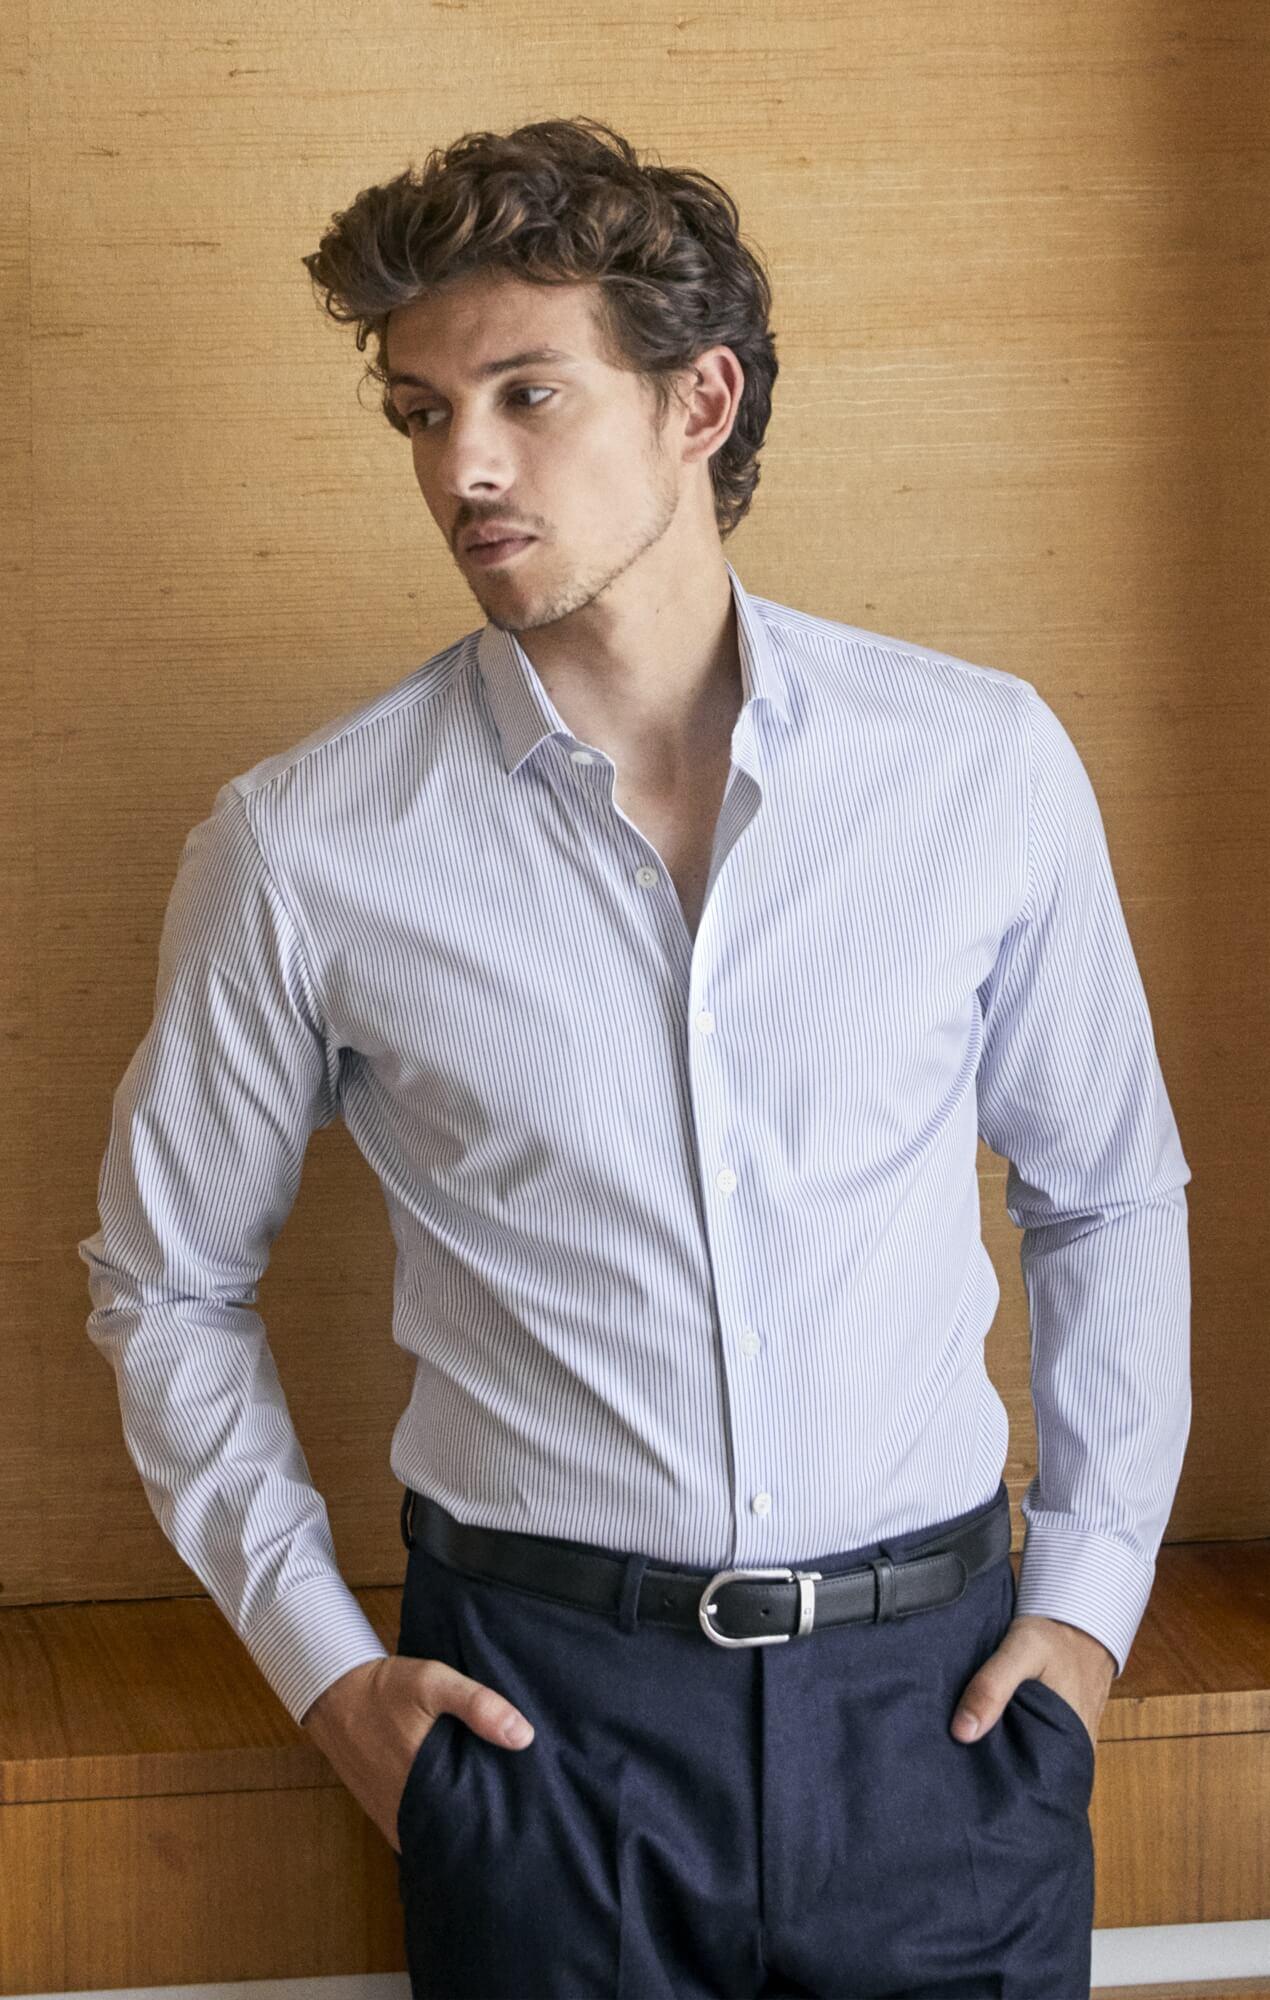 Chemise à rayures equidistantes